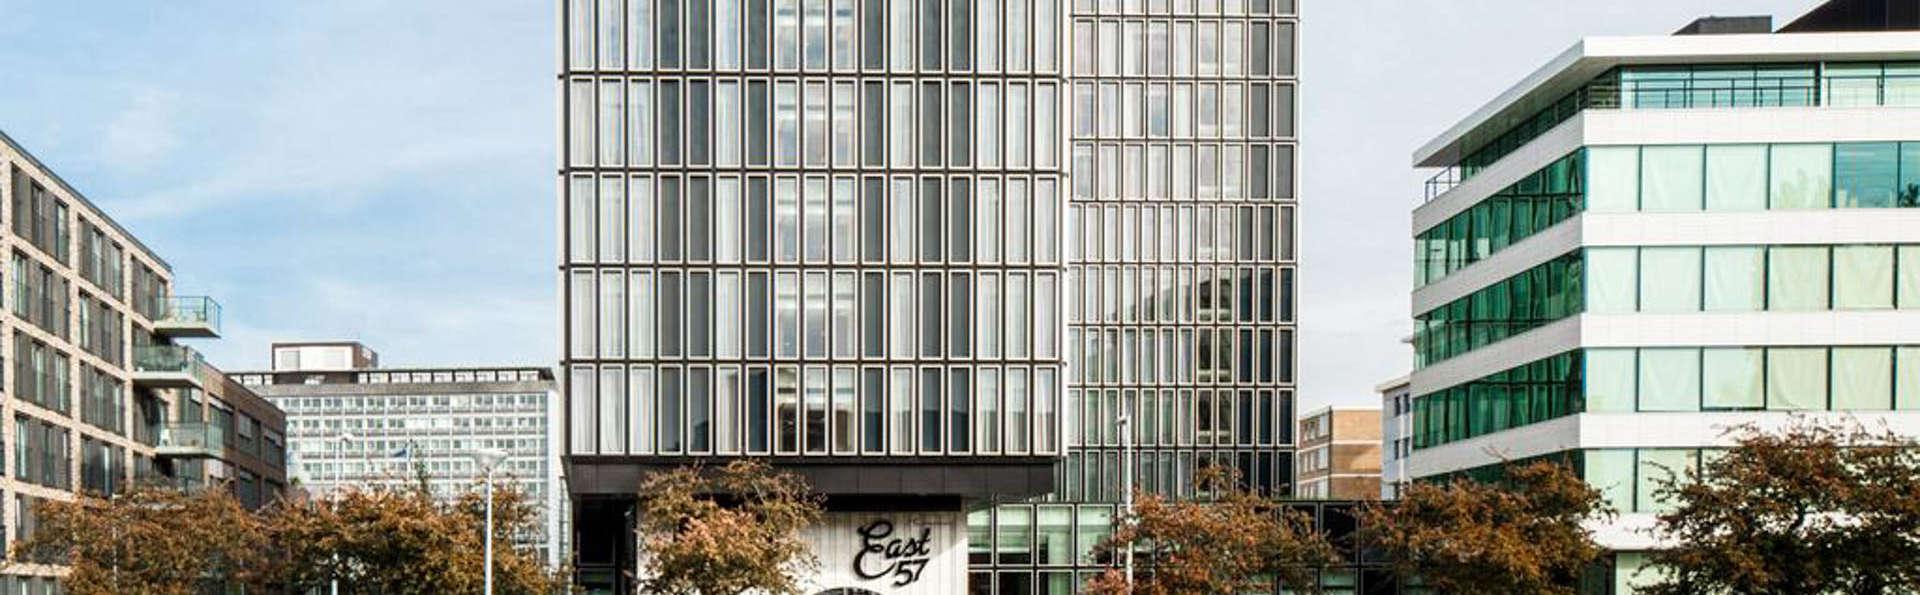 Hotel Casa Amsterdam - EDIT_FRONT.jpg